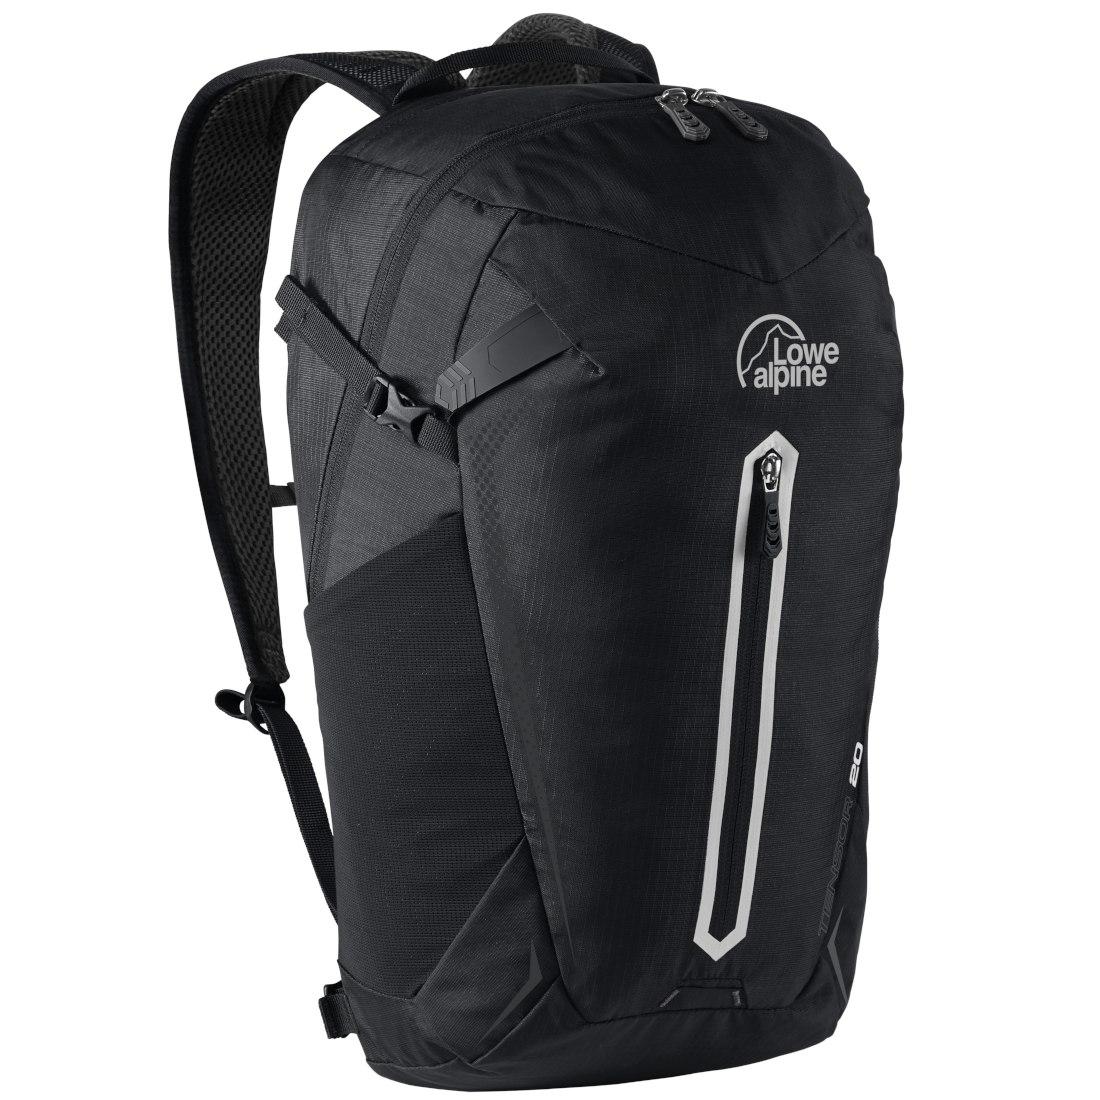 Lowe Alpine Tensor 20 Backpack - Black